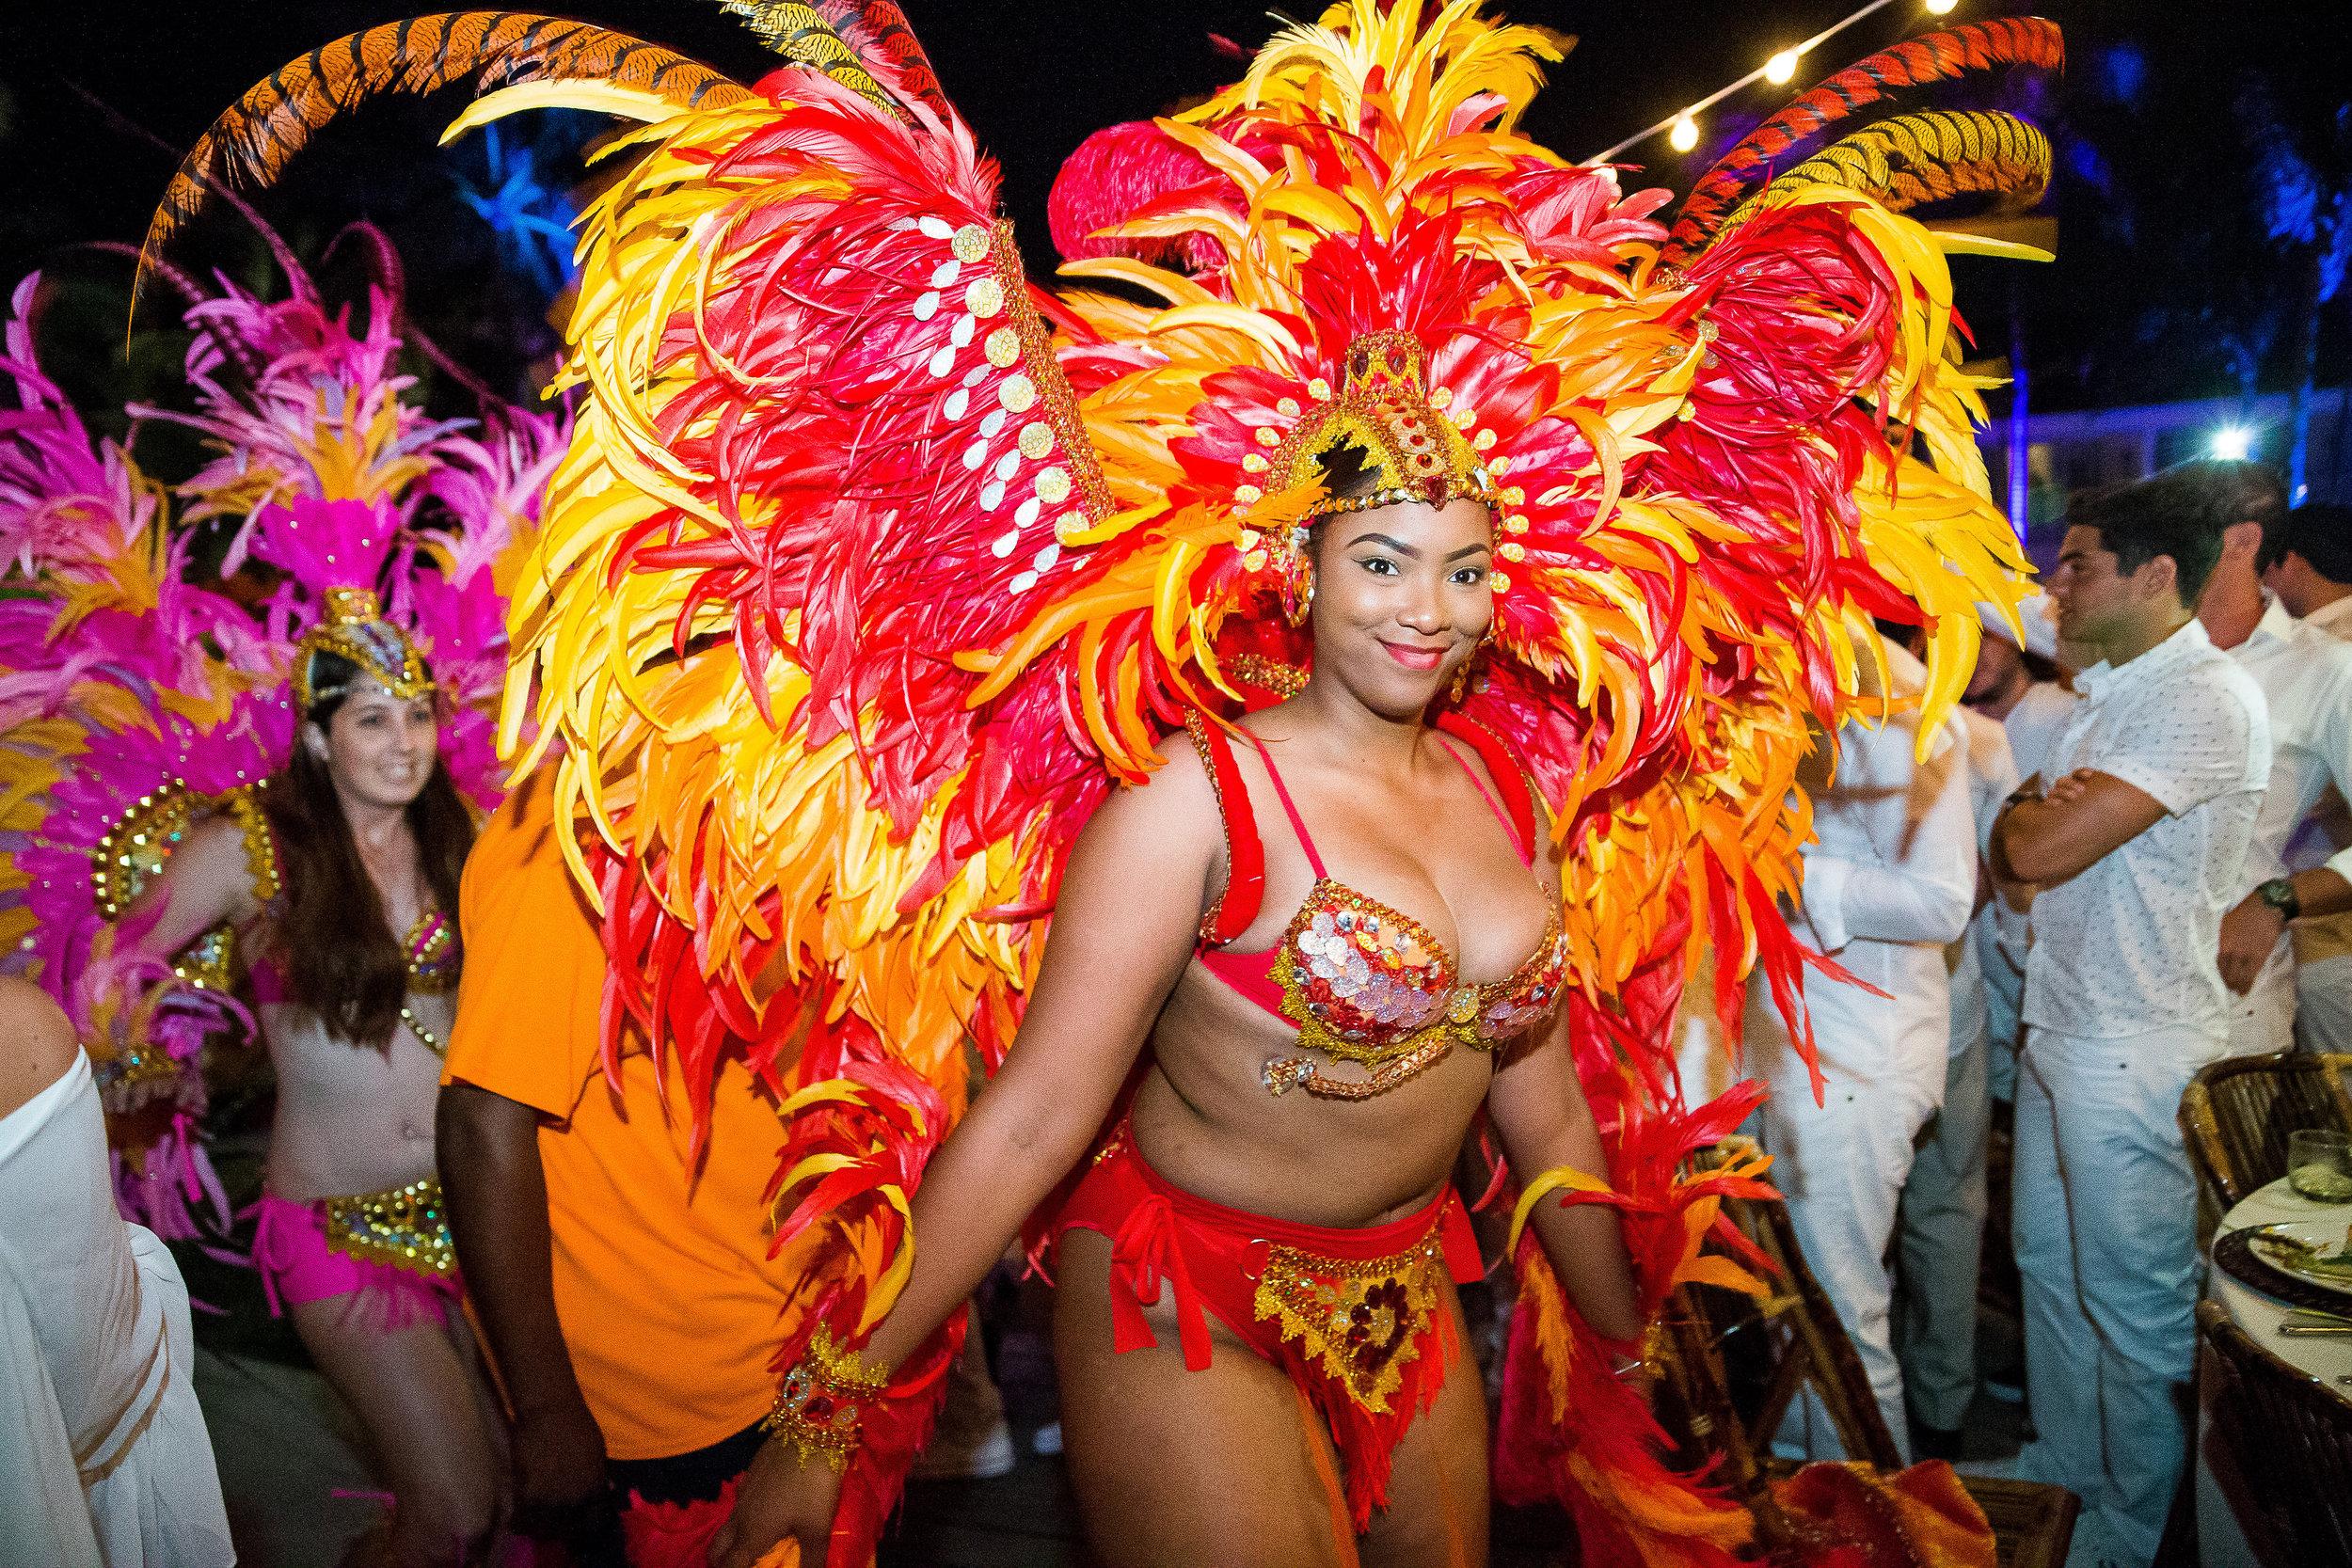 Ceci_New_York_Ceci_Style_Ceci_Johnson_Luxury_Lifestyle_Destination_Bahamas_Wedding_Letterpress_Inspiration_Design_Custom_Couture_Personalized_Invitations_47.jpg